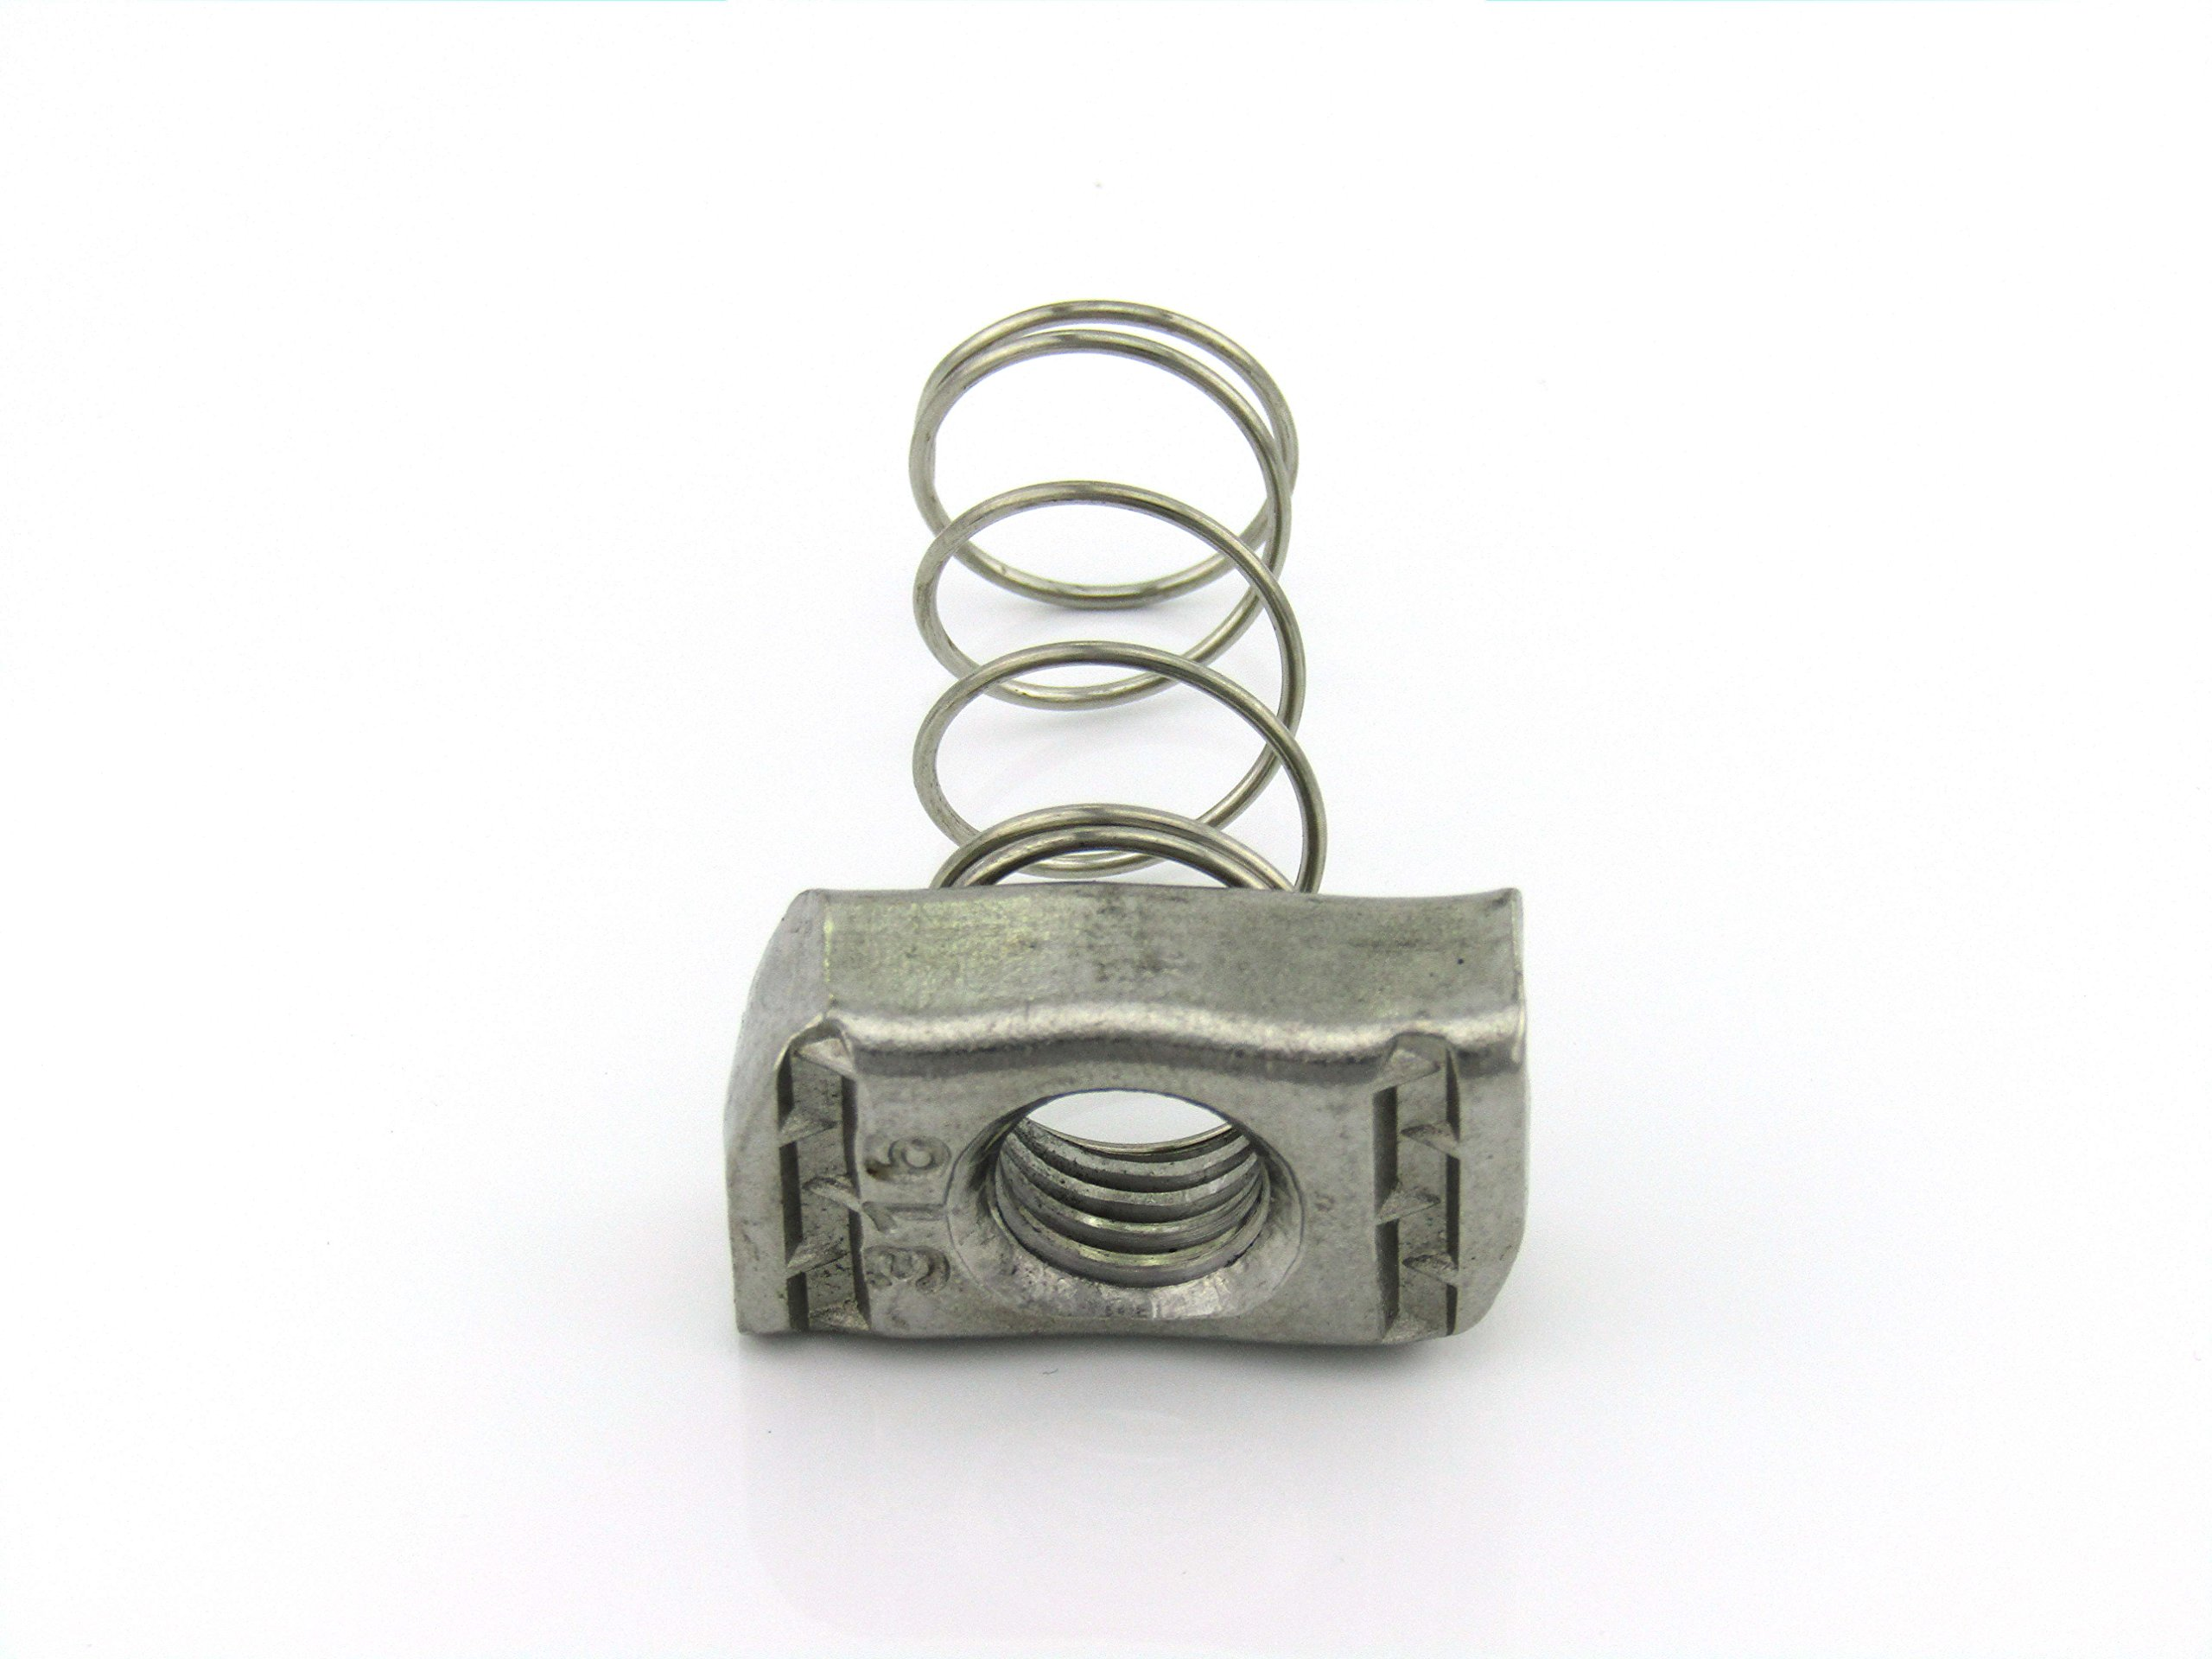 1/2-13X1/2 Thick, Regular Spring Nut, S/S (100 per Box) by ARWS